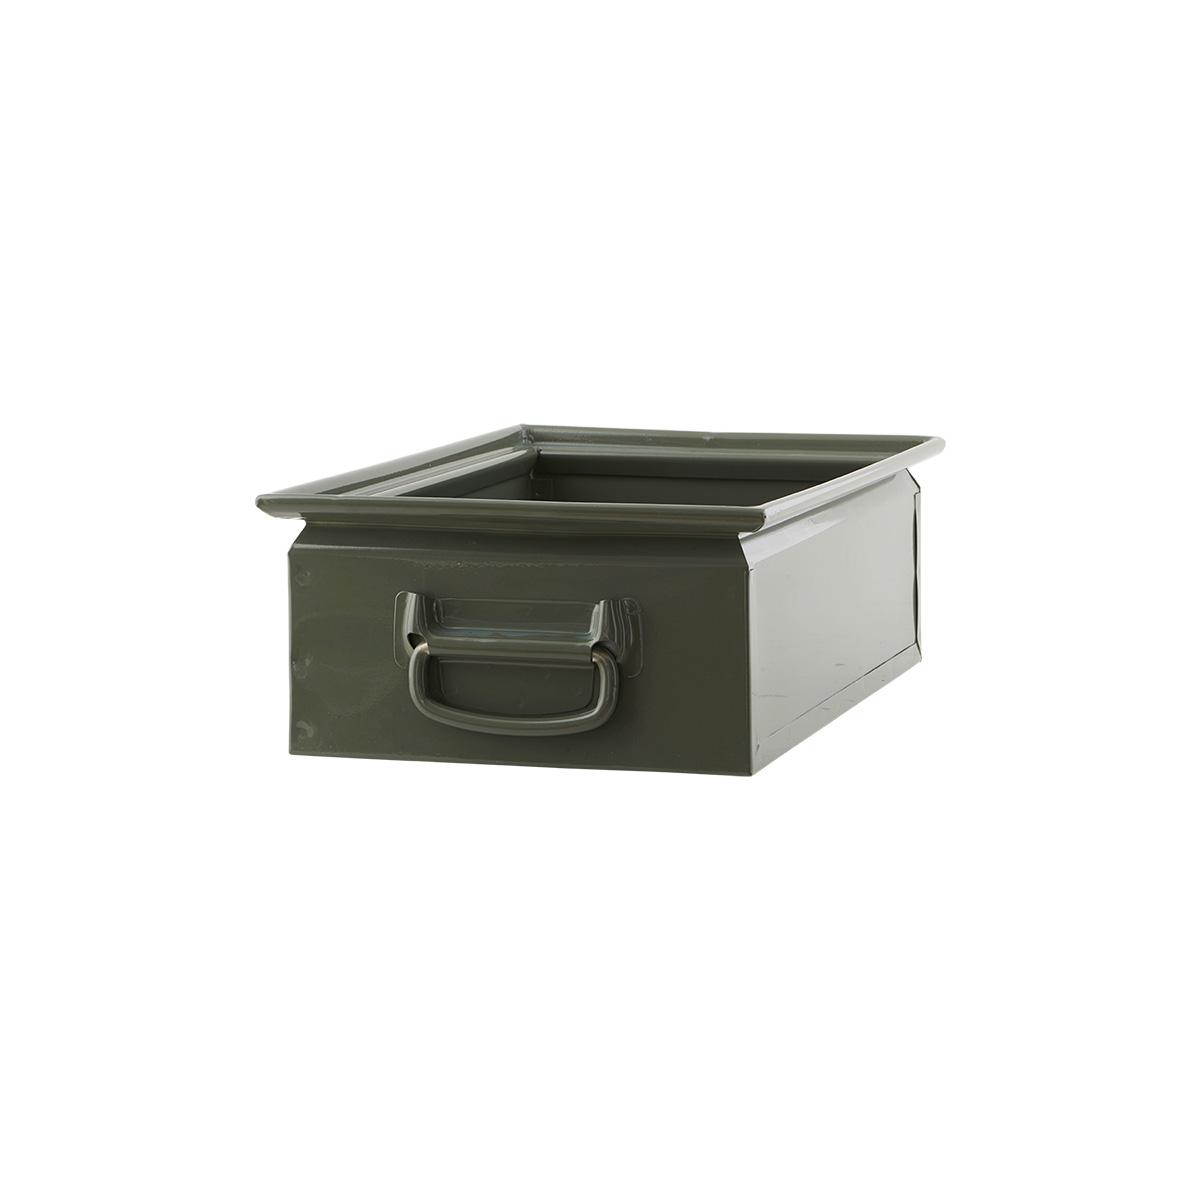 storage box 2 army green 30x45x15cm house doctor su. Black Bedroom Furniture Sets. Home Design Ideas